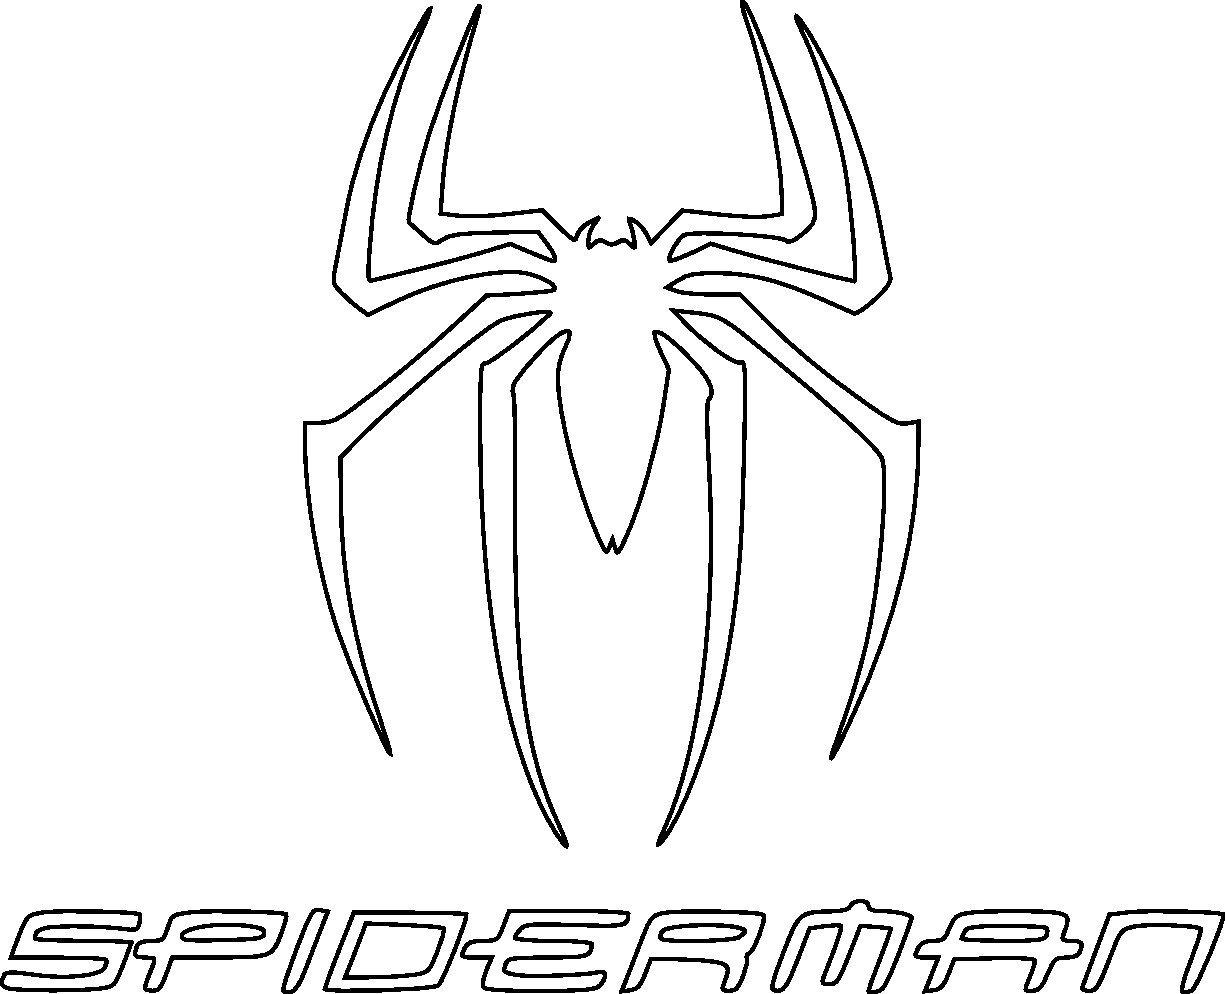 Spiderman Logo Drawing at GetDrawings.com.